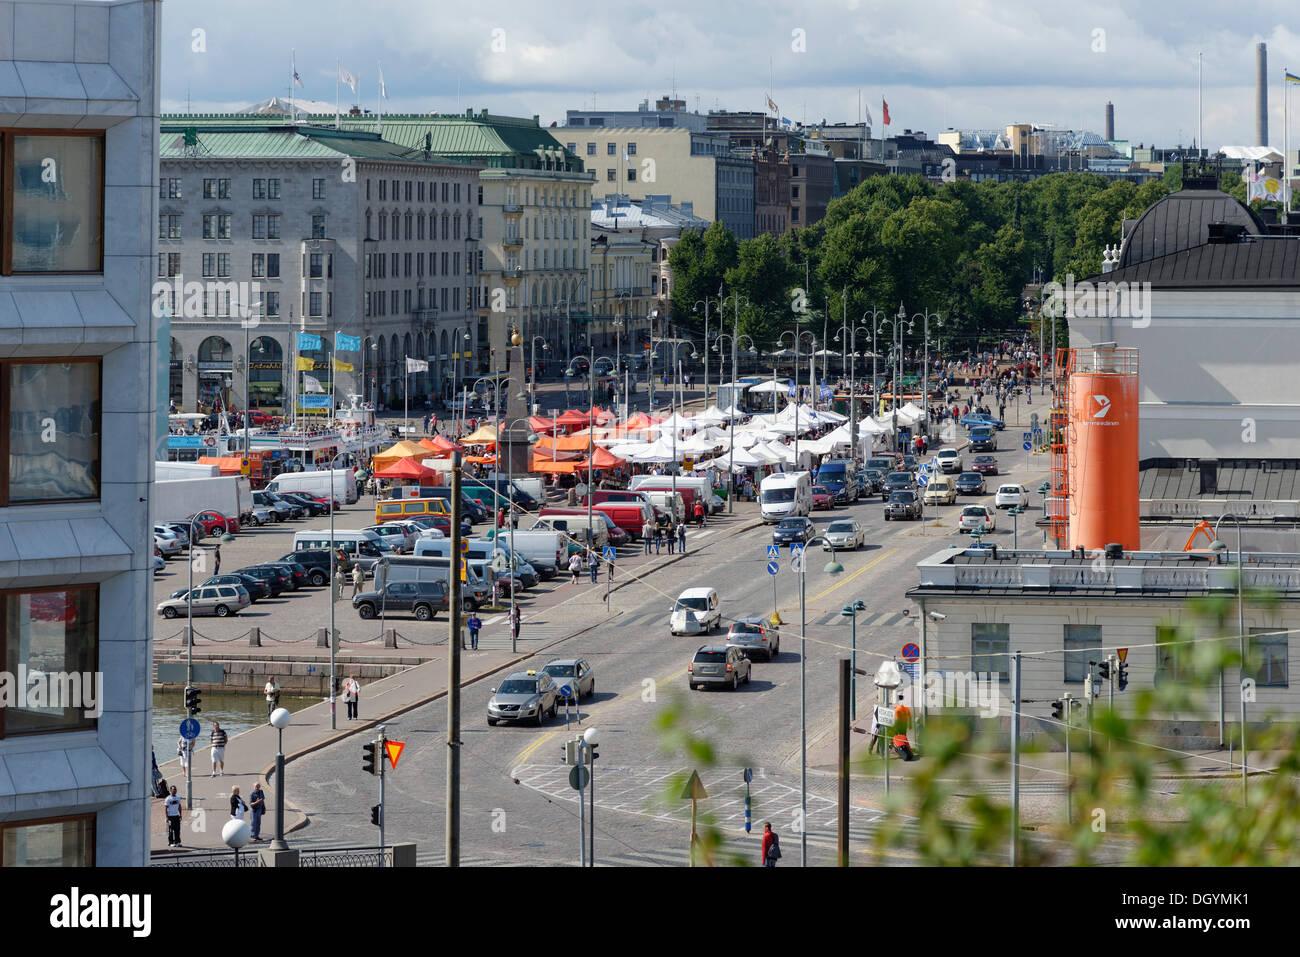 Market square, Kauppatori, Helsinki, Uusimaa, Finland - Stock Image